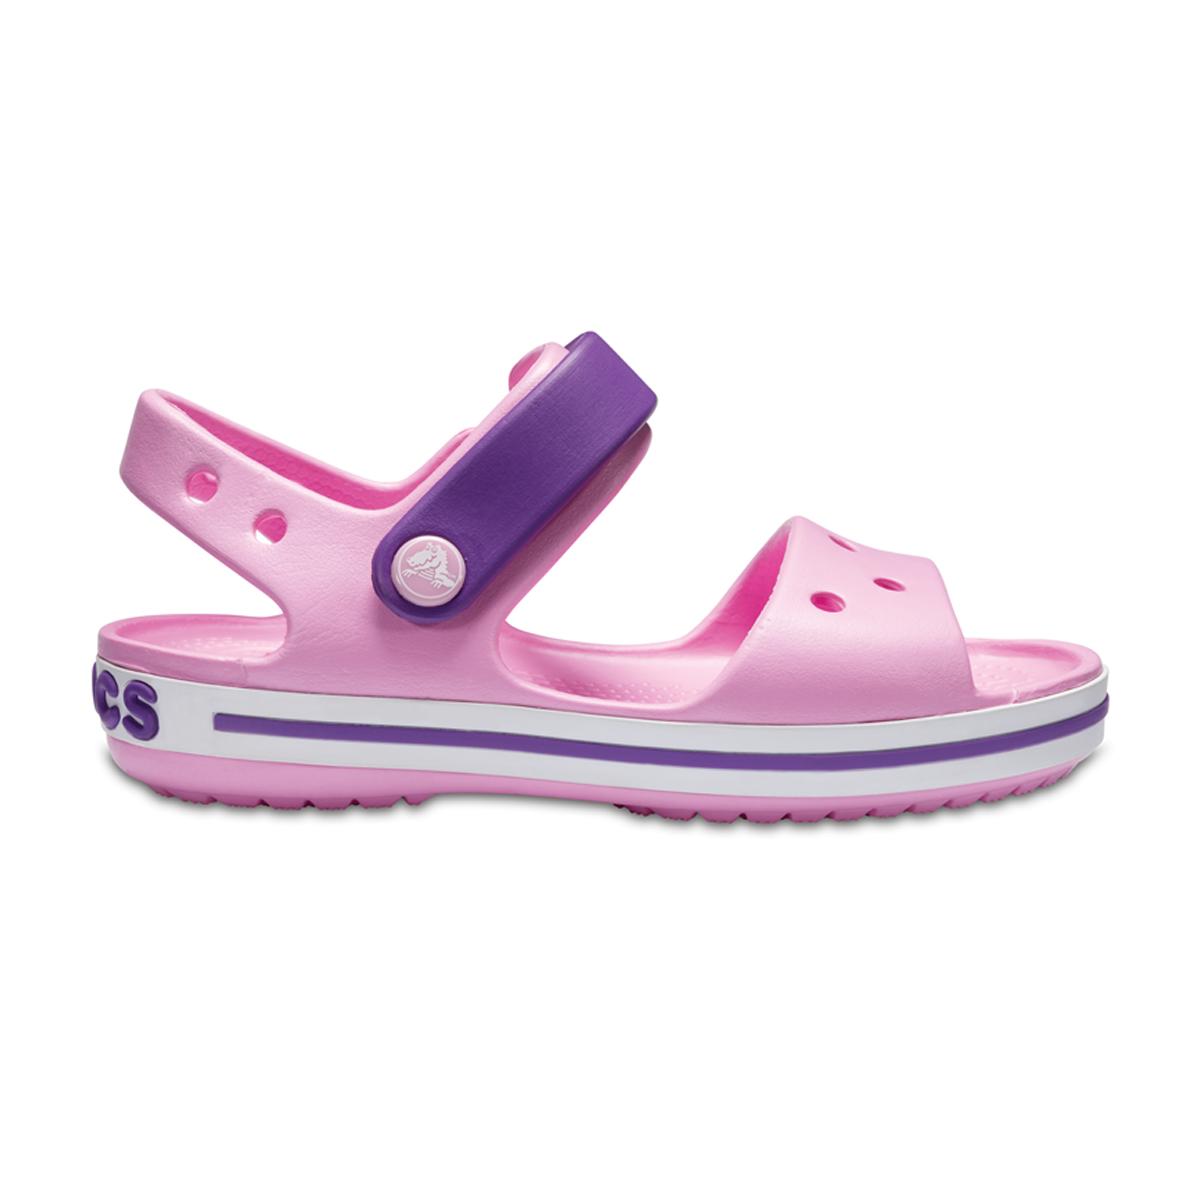 Crocs Crocband Sandal Kids - Karanfil/Ametist